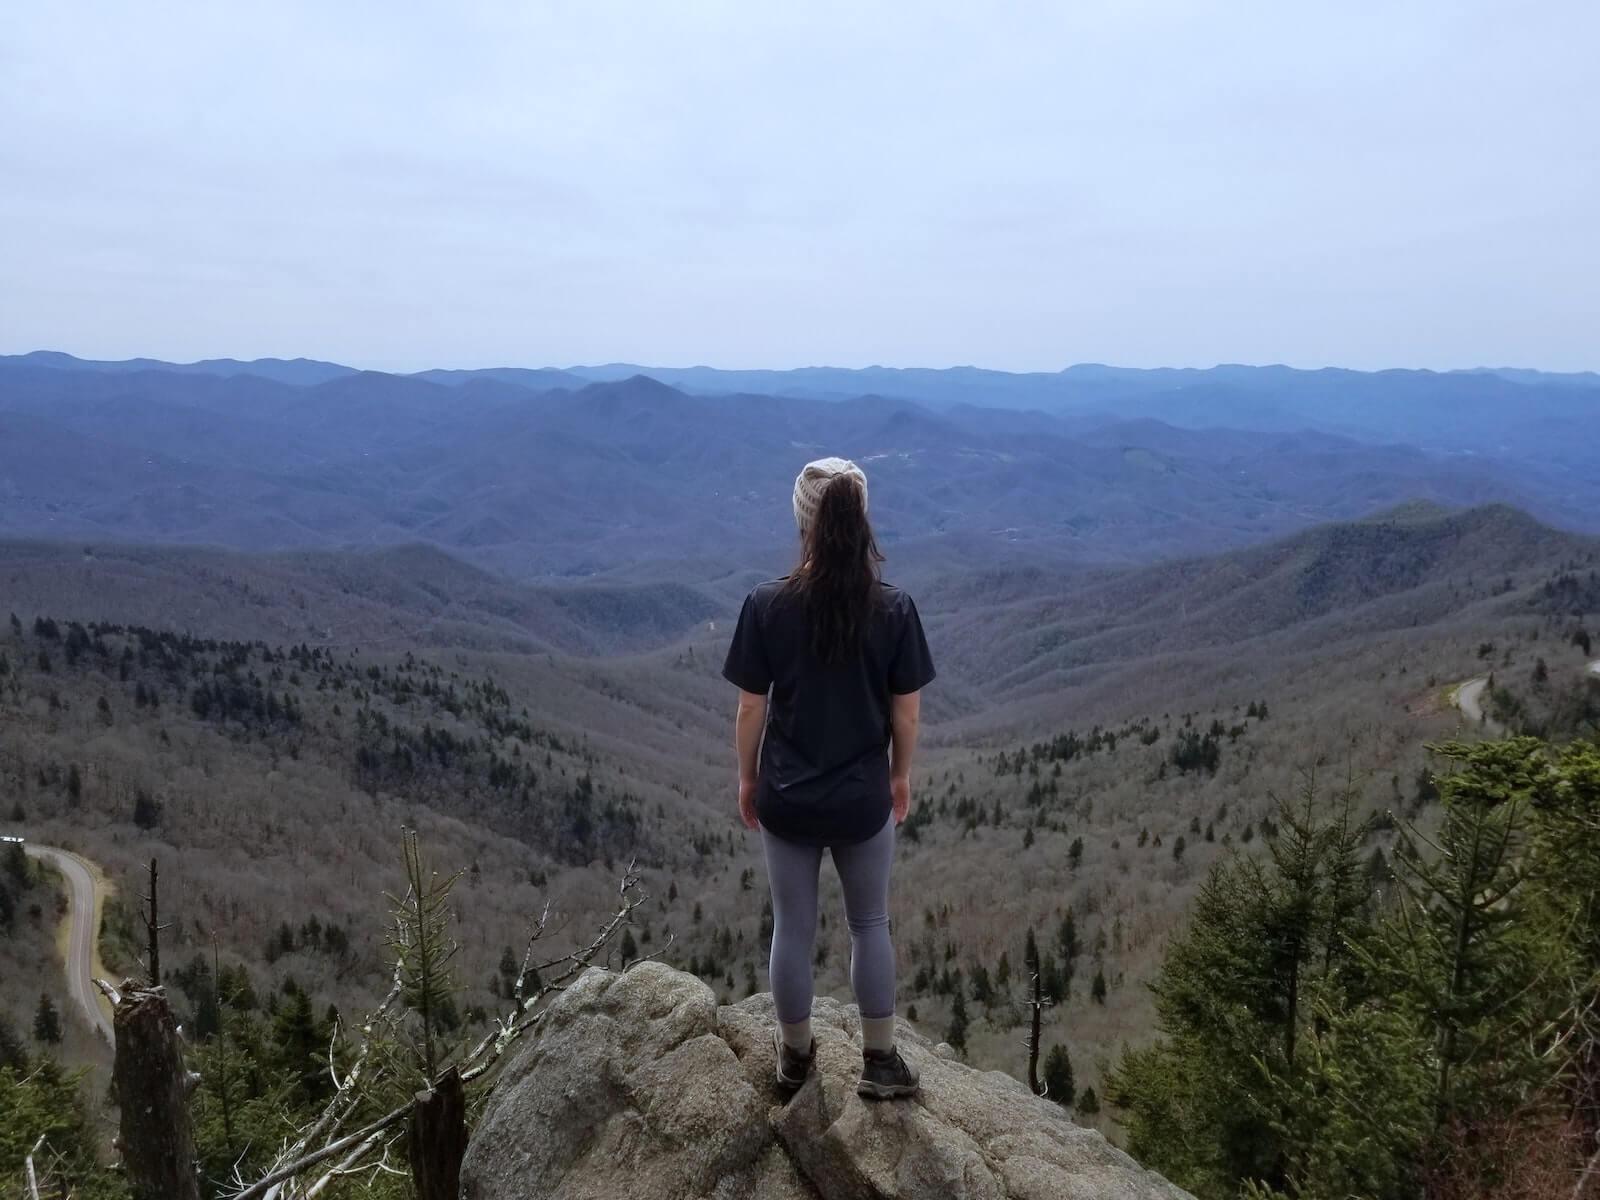 woman standing on cliff overlooking mountainous valley wilderness nursing